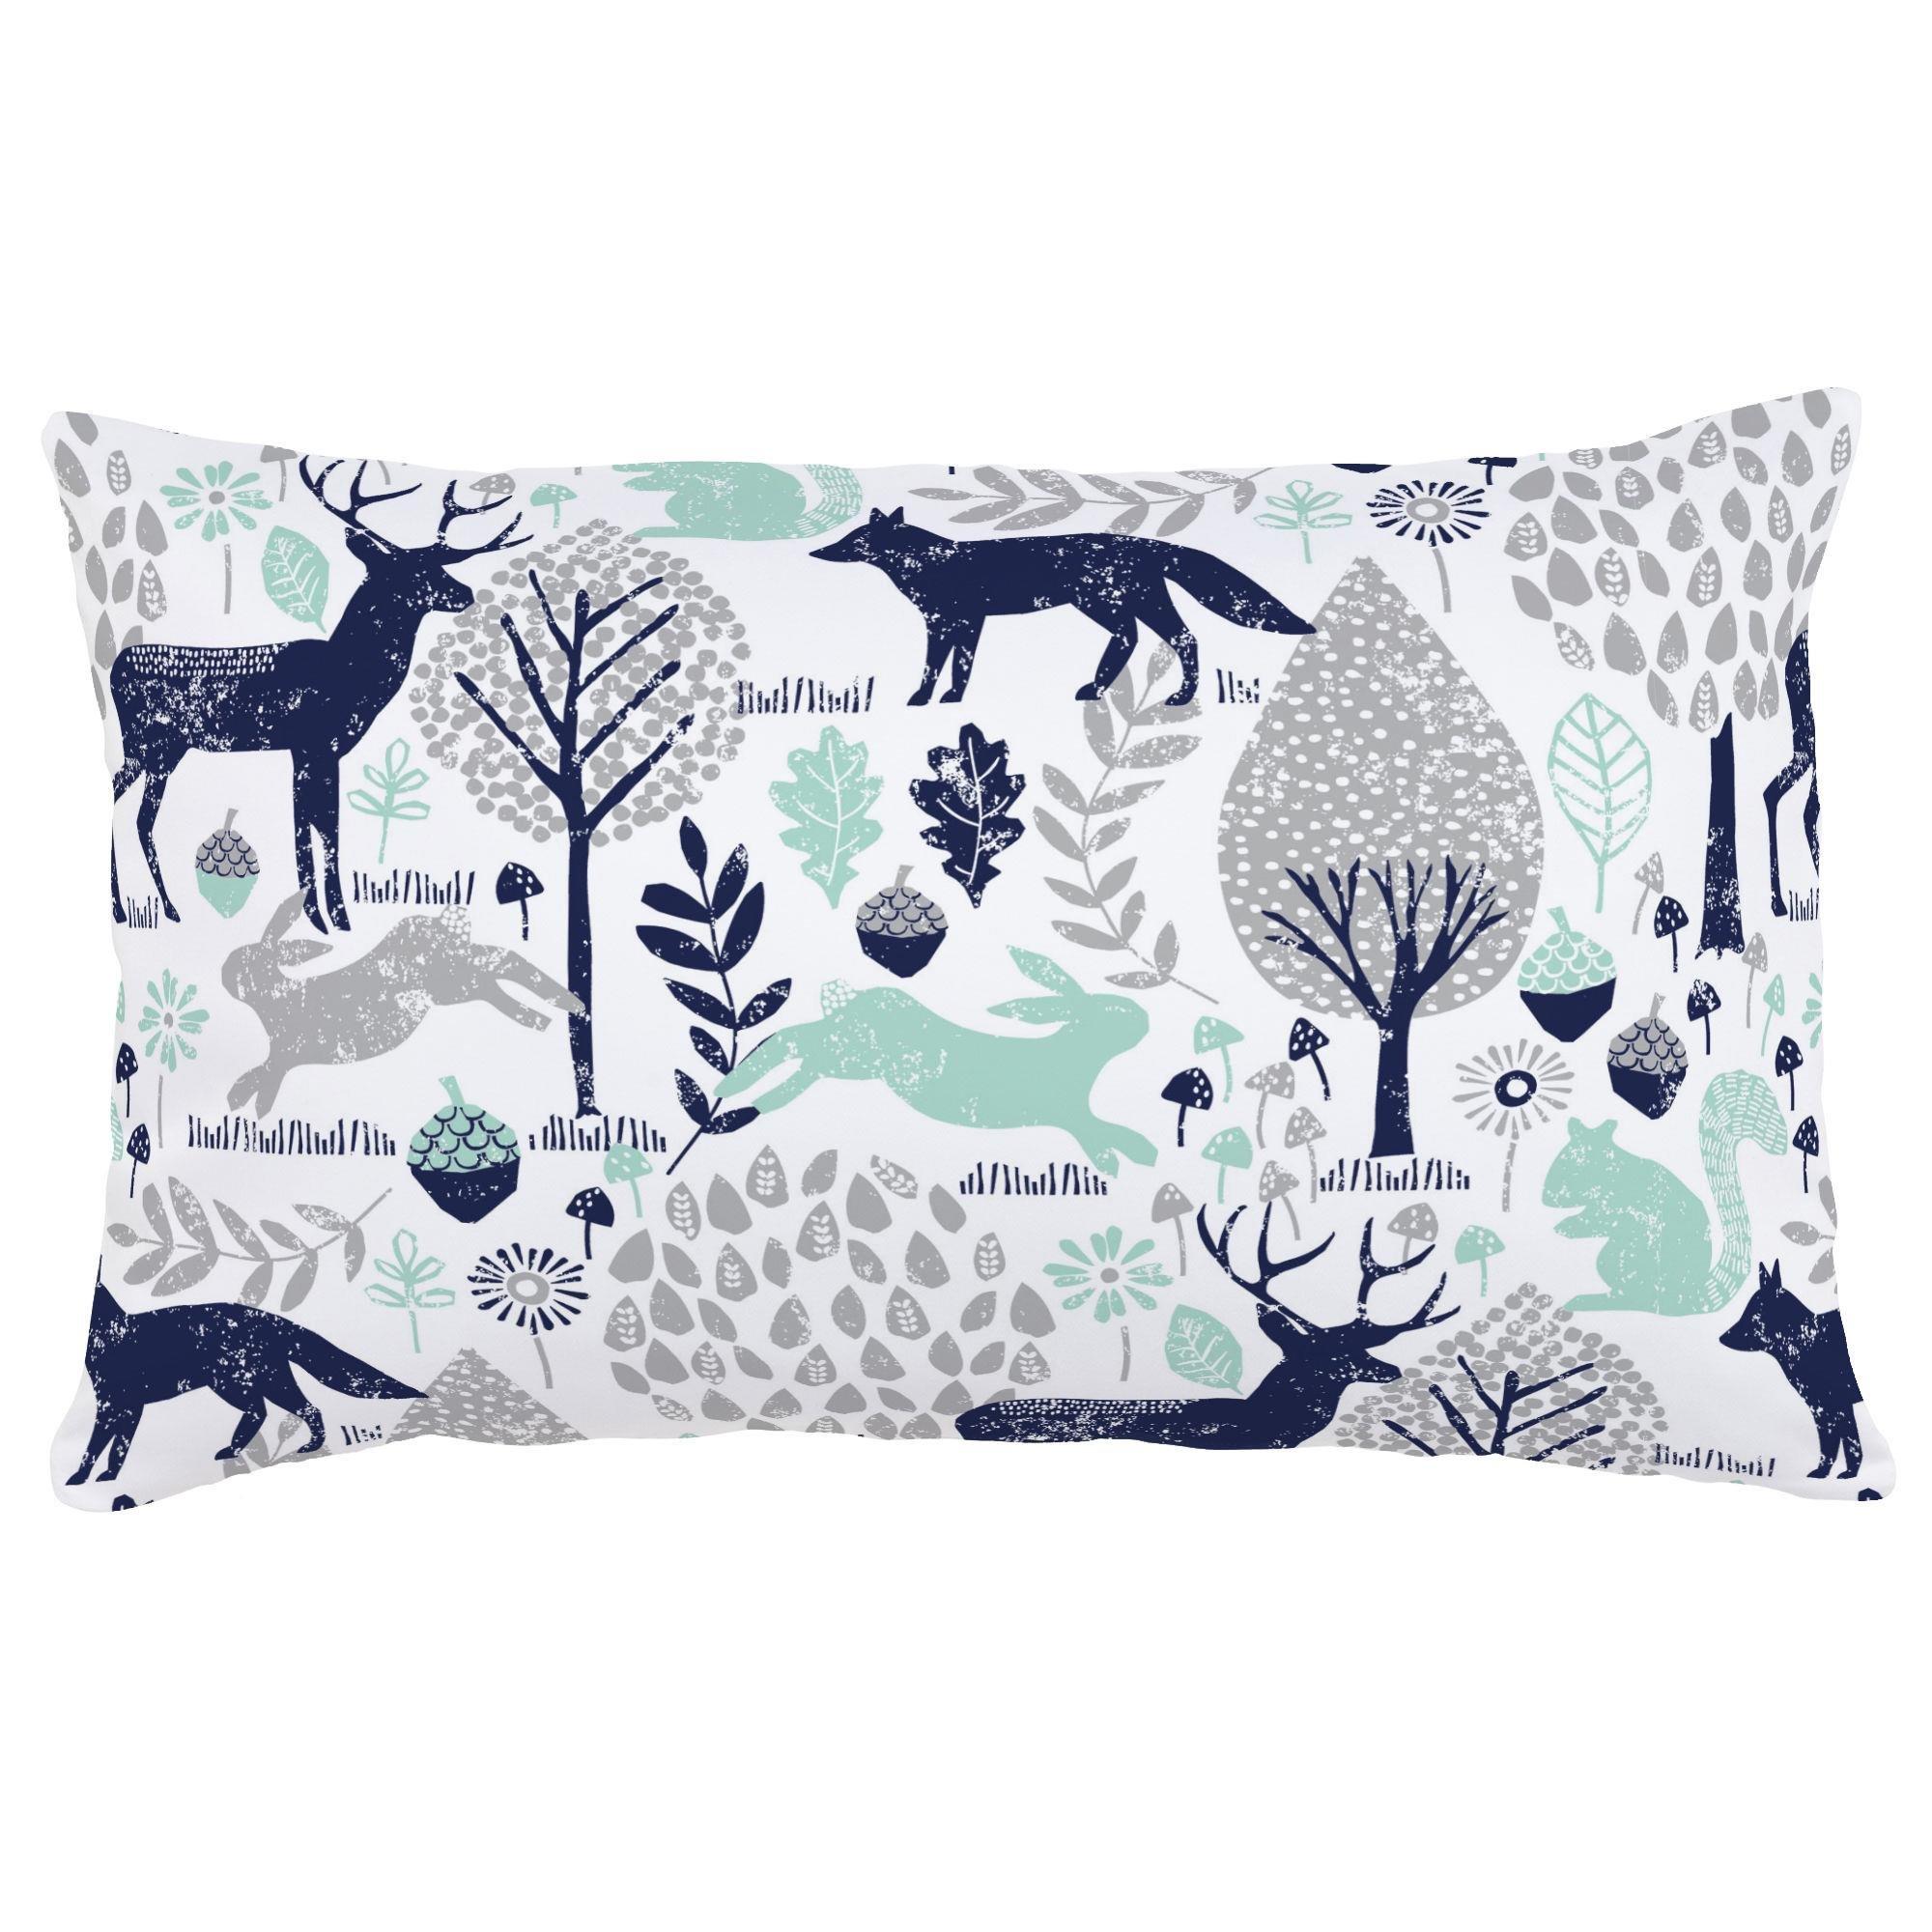 Carousel Designs Navy and Mint Woodland Animals Lumbar Pillow - Organic 100% Cotton Lumbar Pillow Cover + Insert - Made in The USA